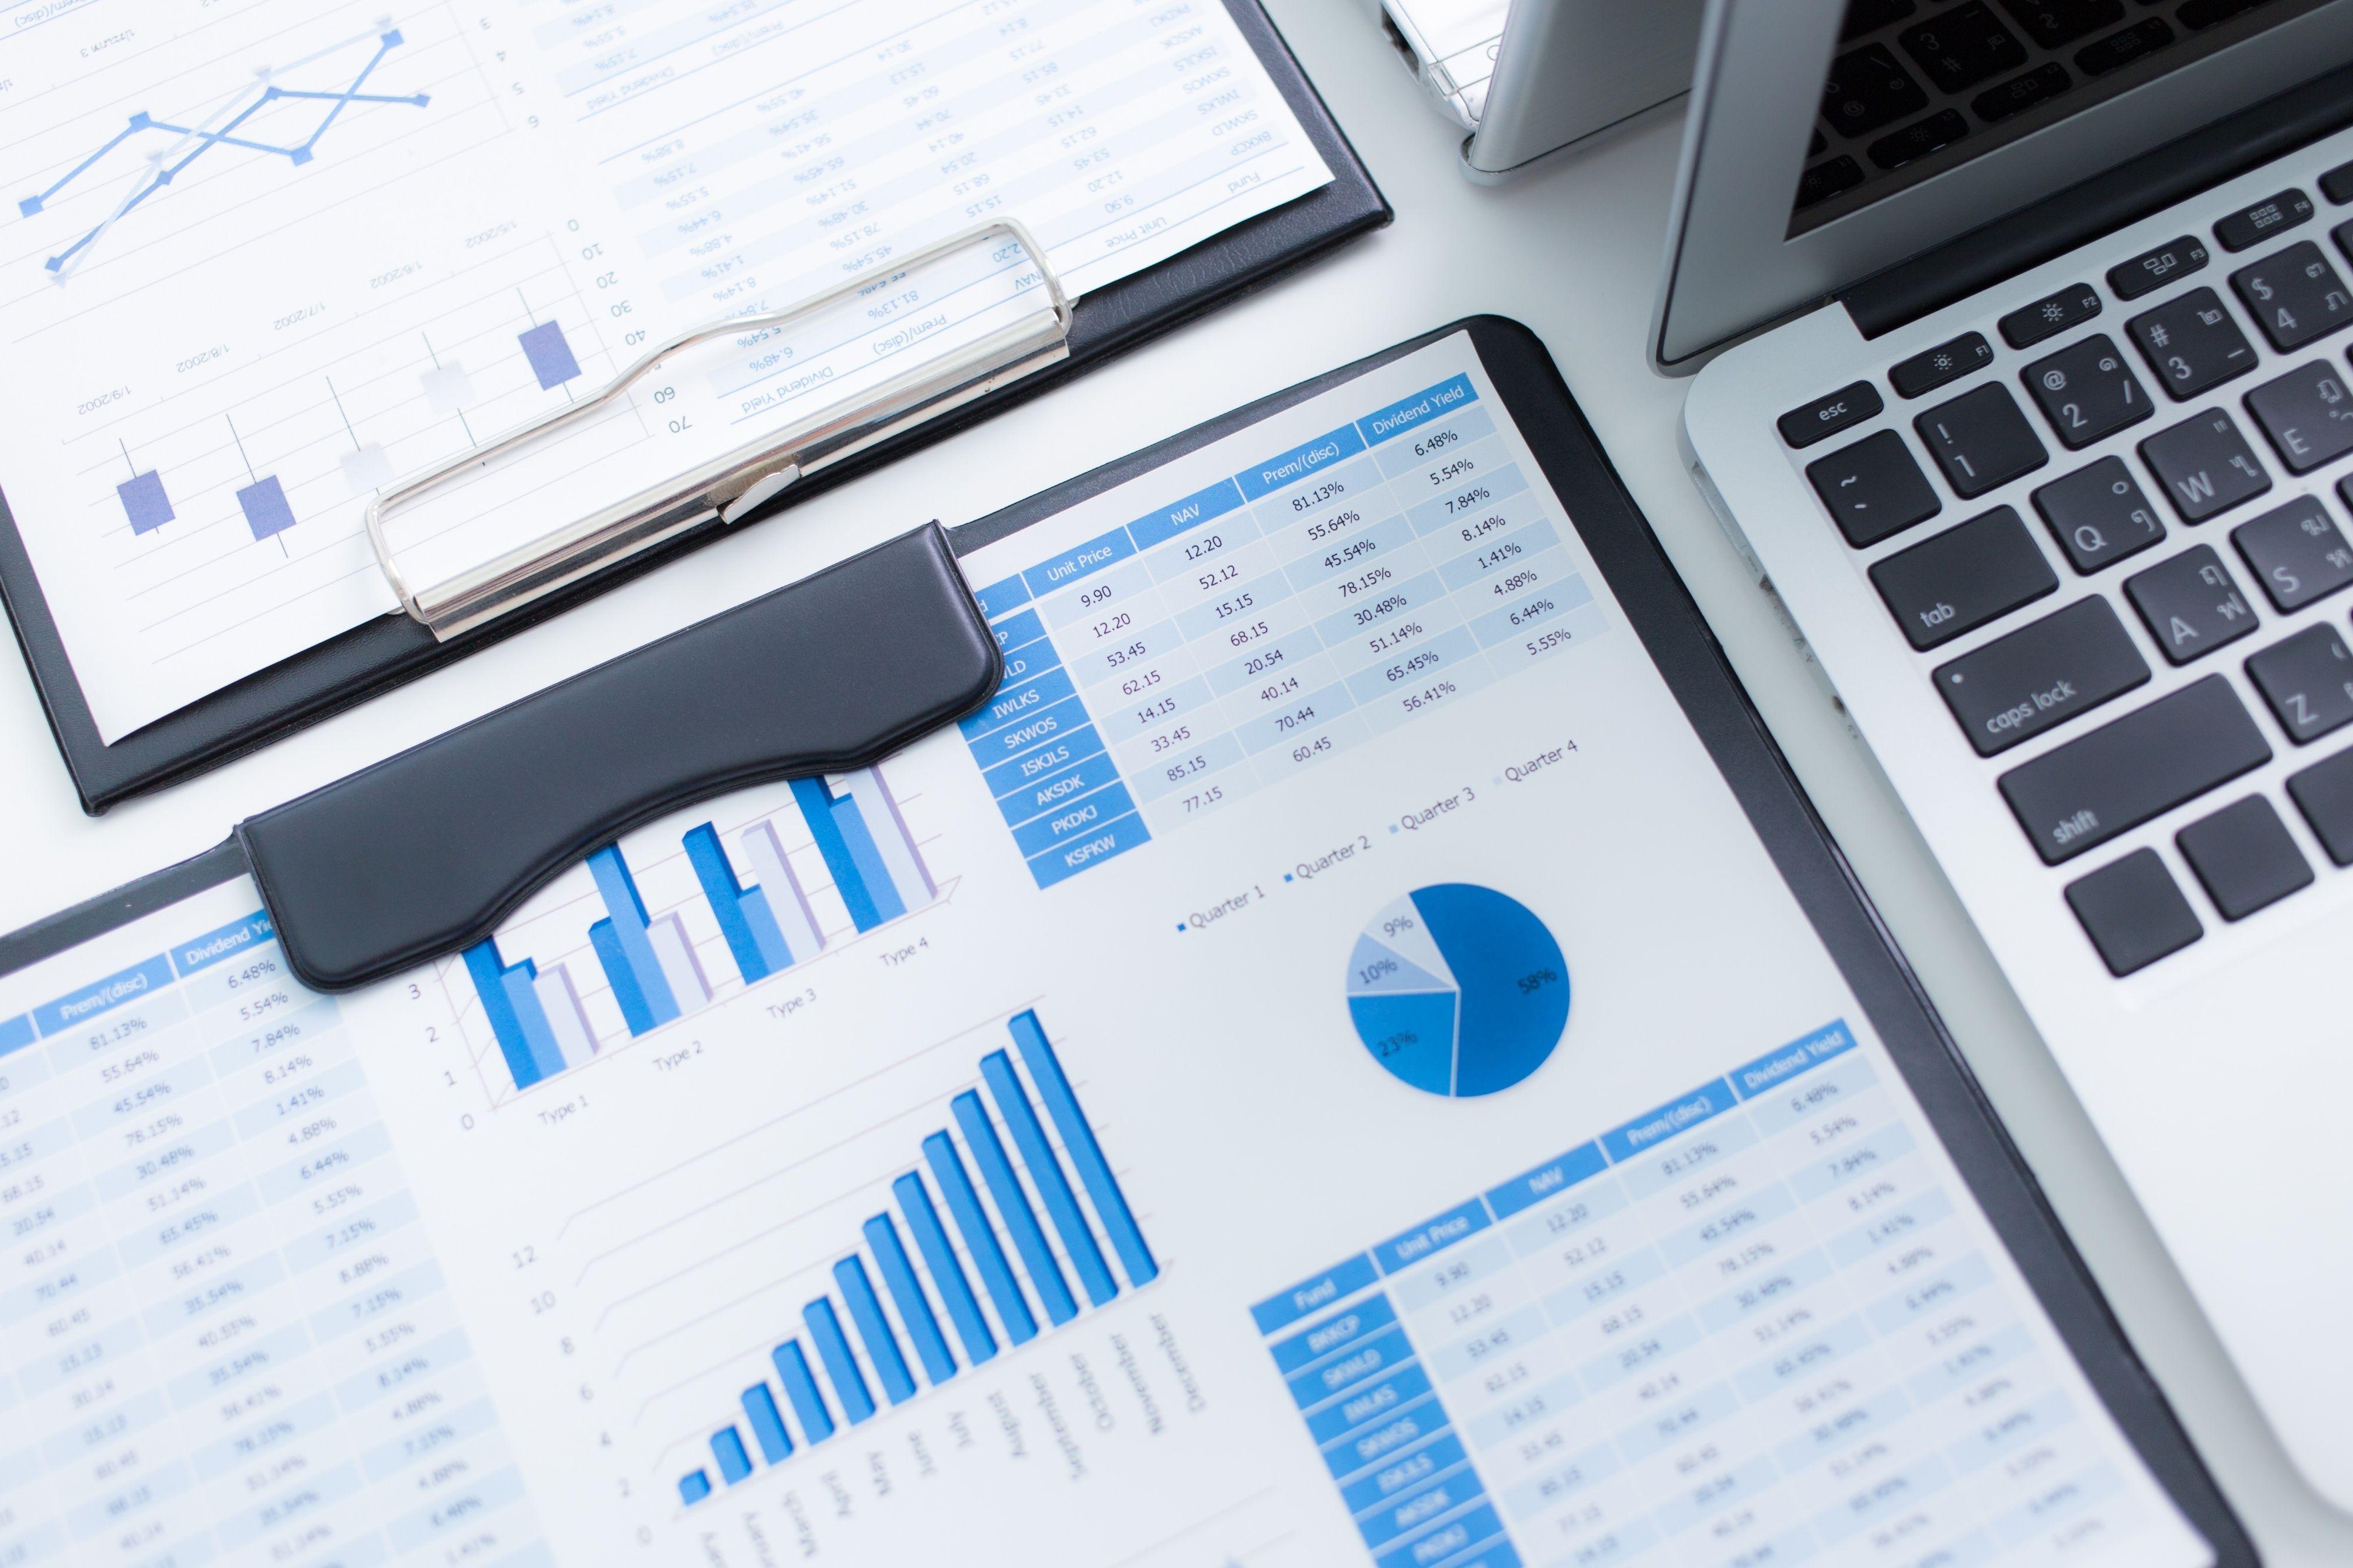 Secrets of the best financial advisor websites revealed